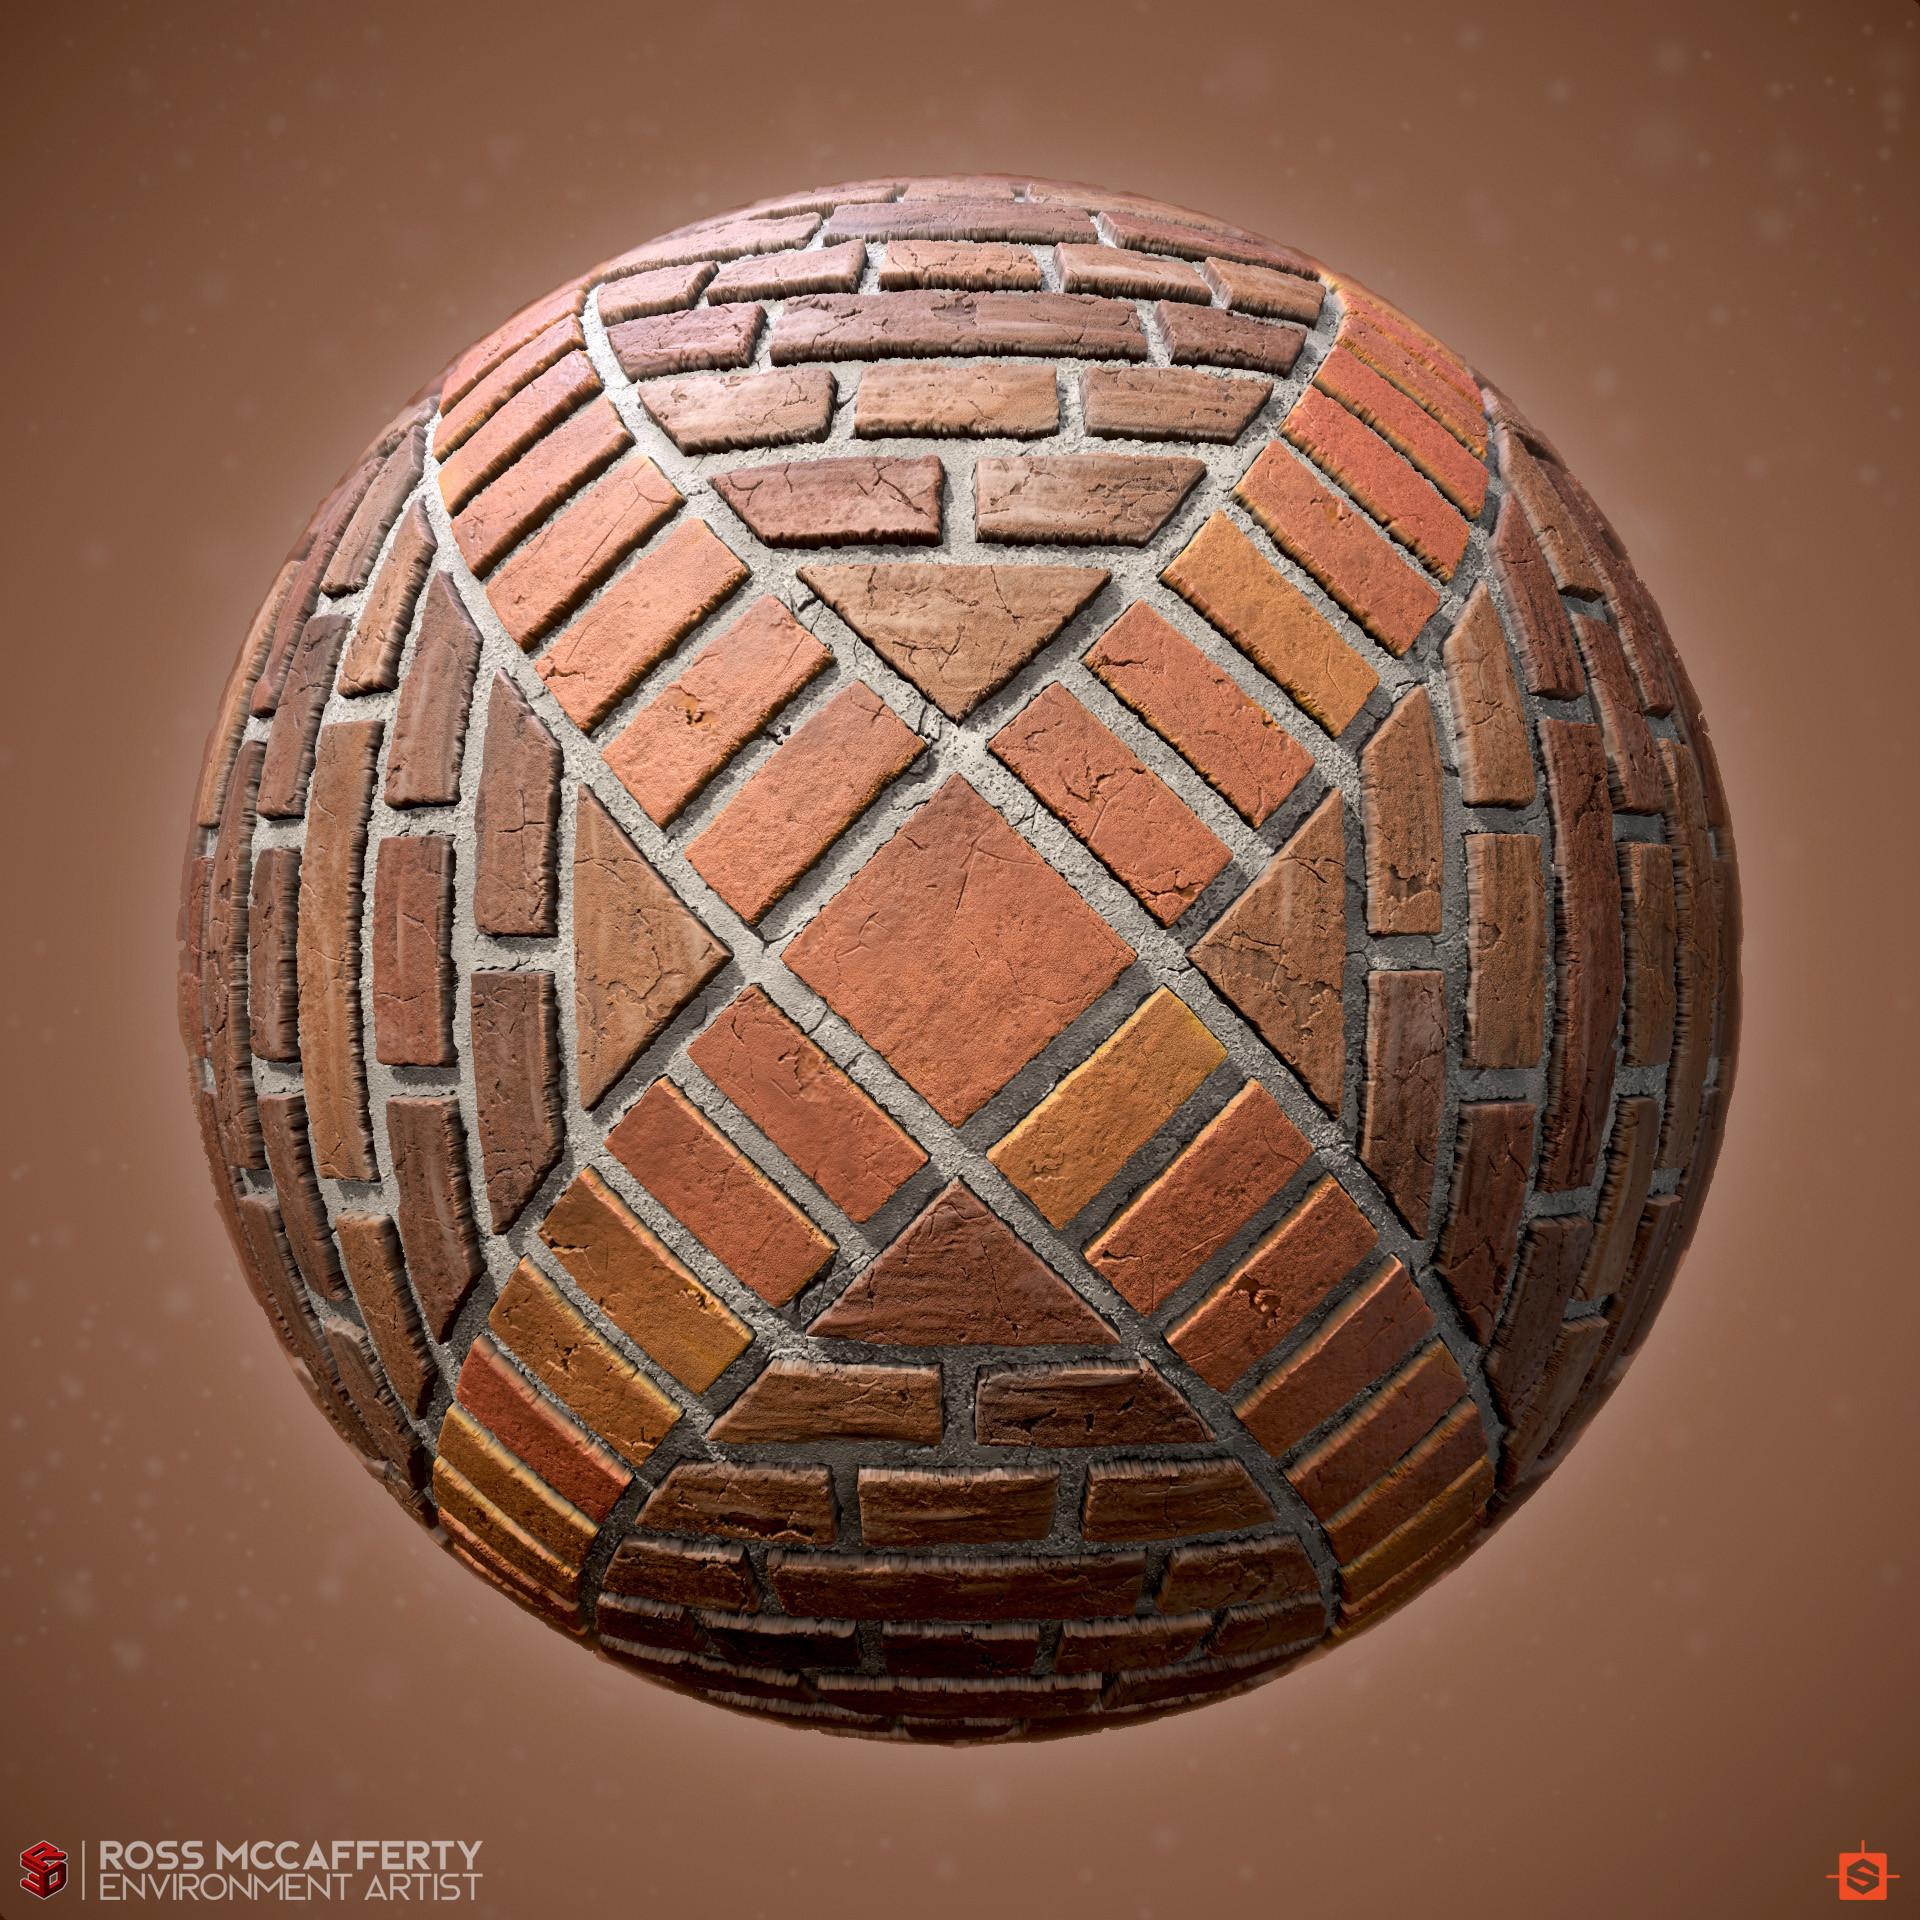 Ross mccafferty brick 03